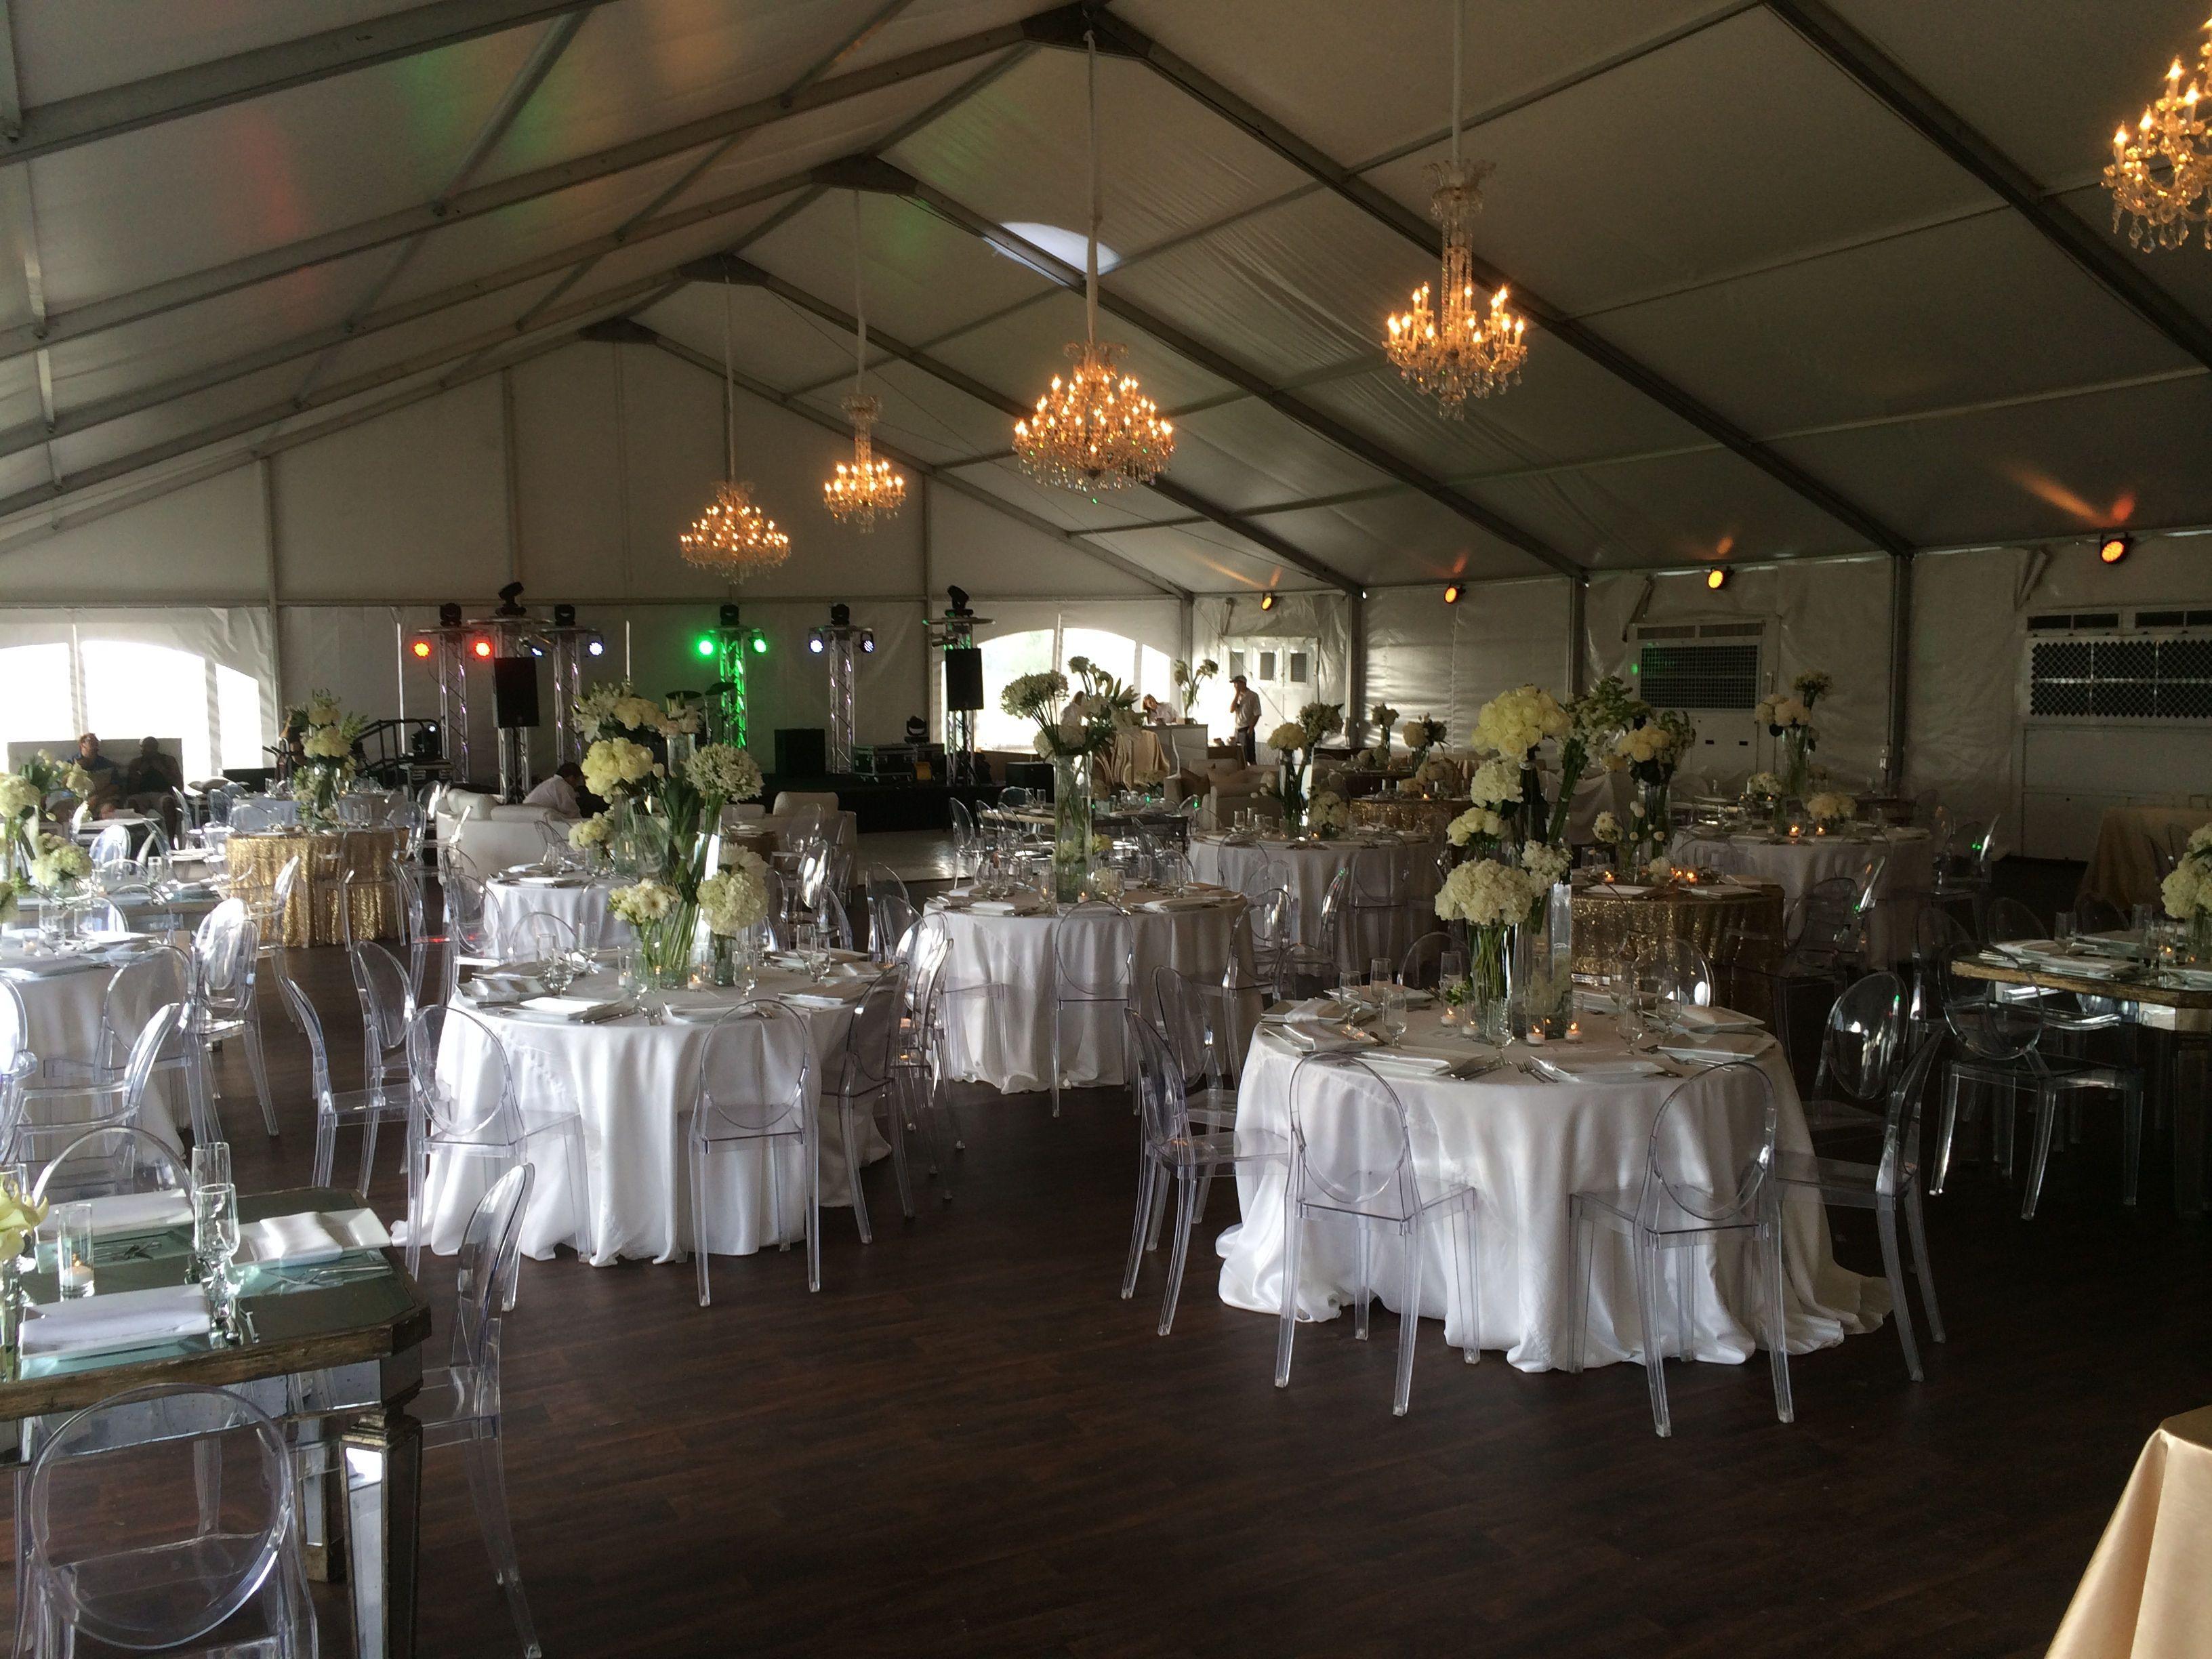 Inside wedding decoration ideas  Wedding reception under structure tent  Weddings u Reception Ideas